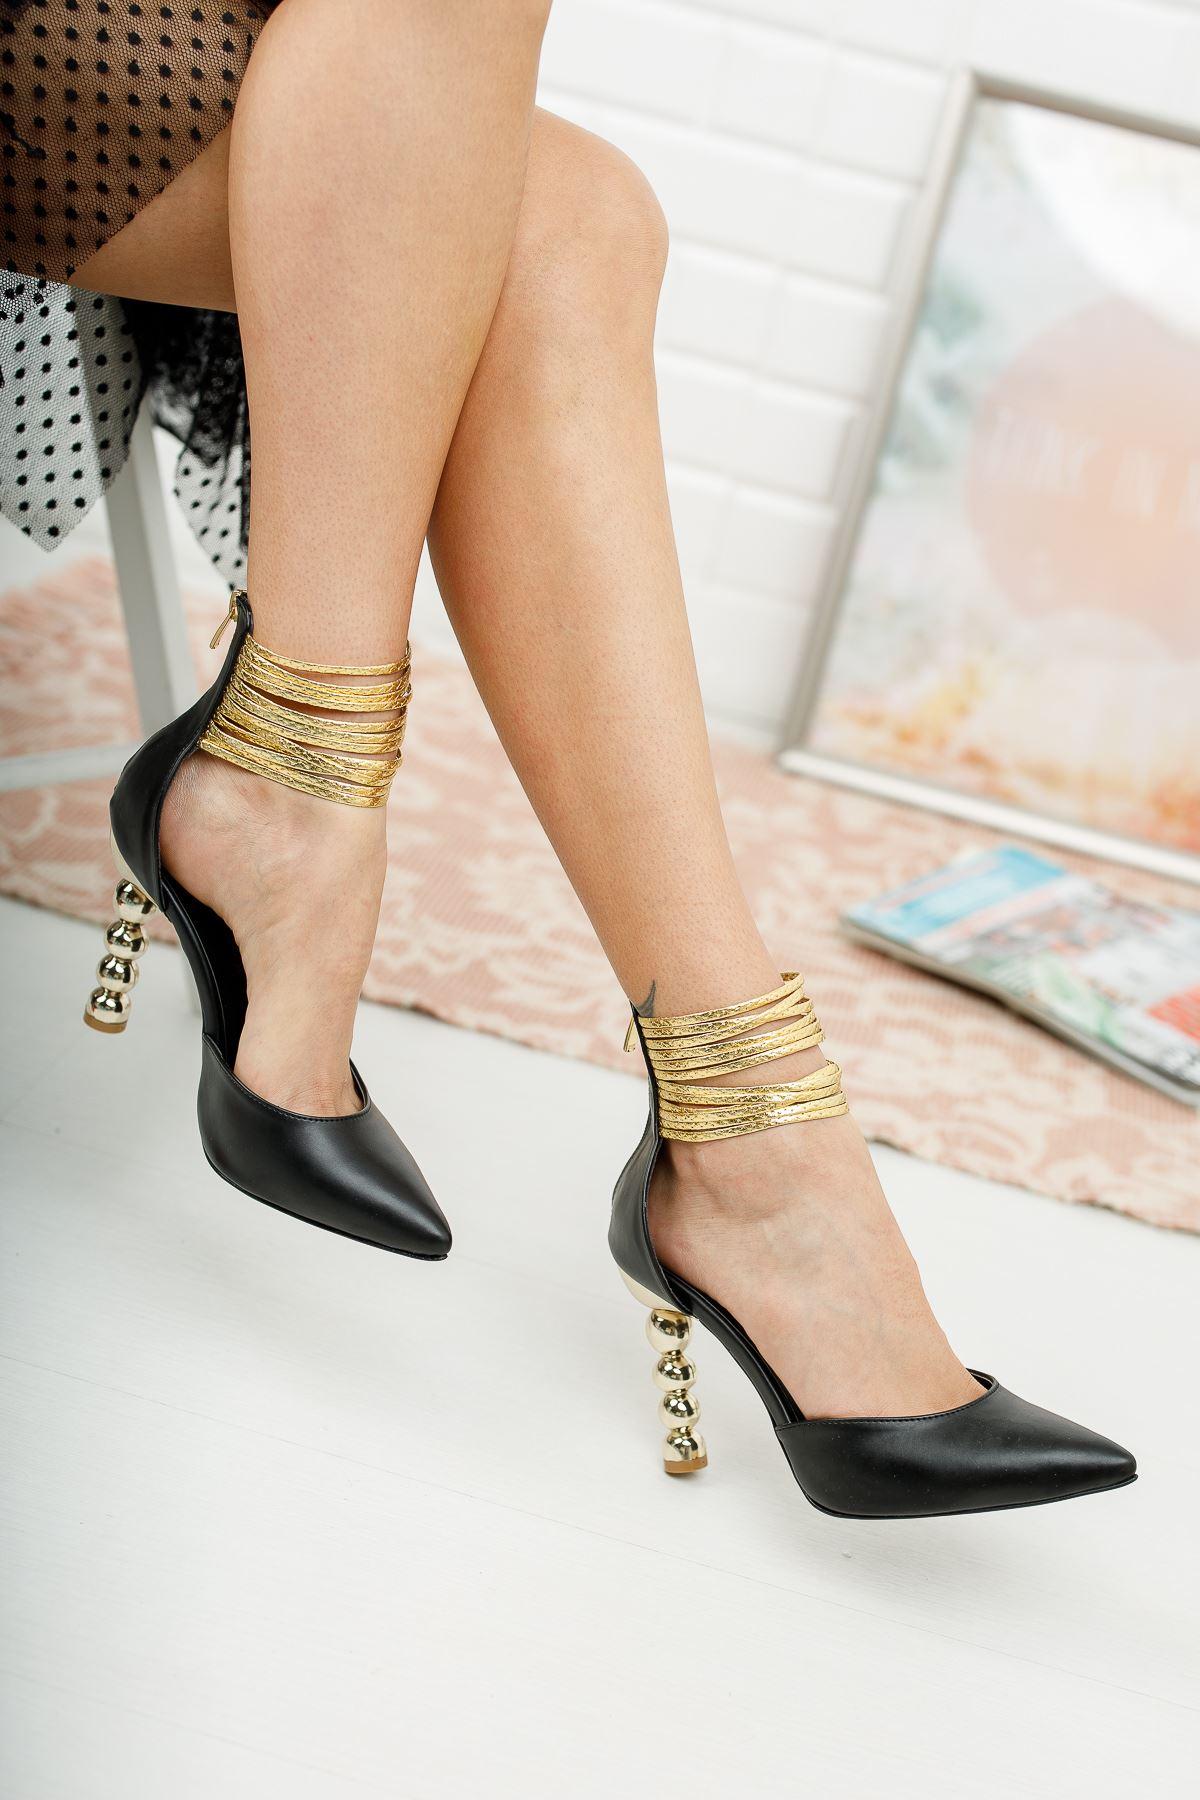 Miny Siyah Cilt Topuklu Ayakkabı Stiletto